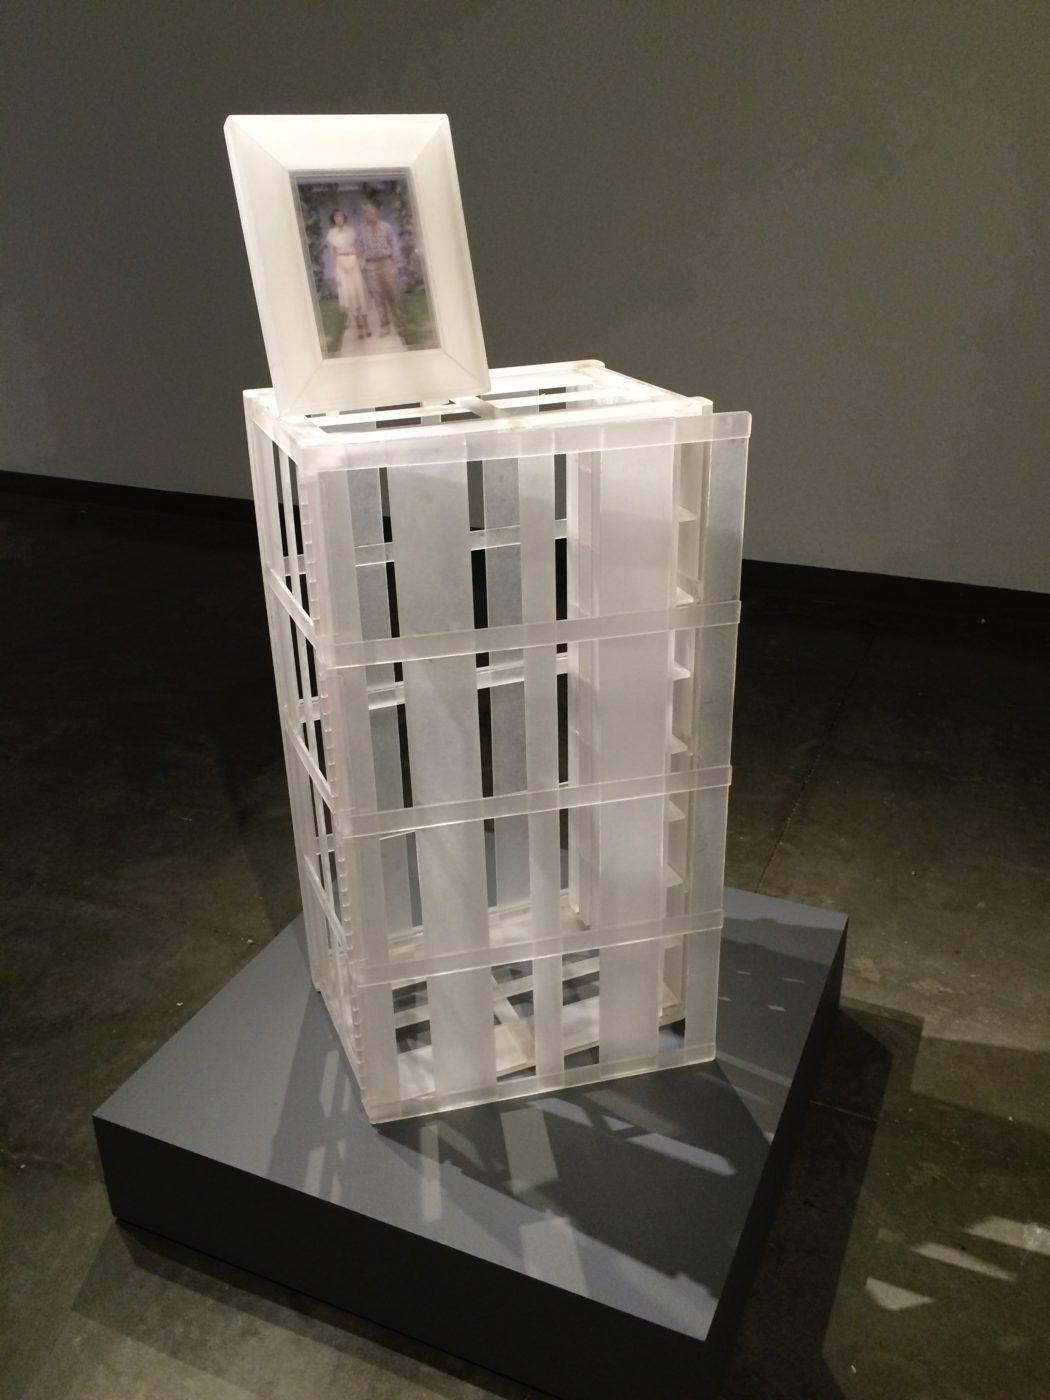 Crate, 2009